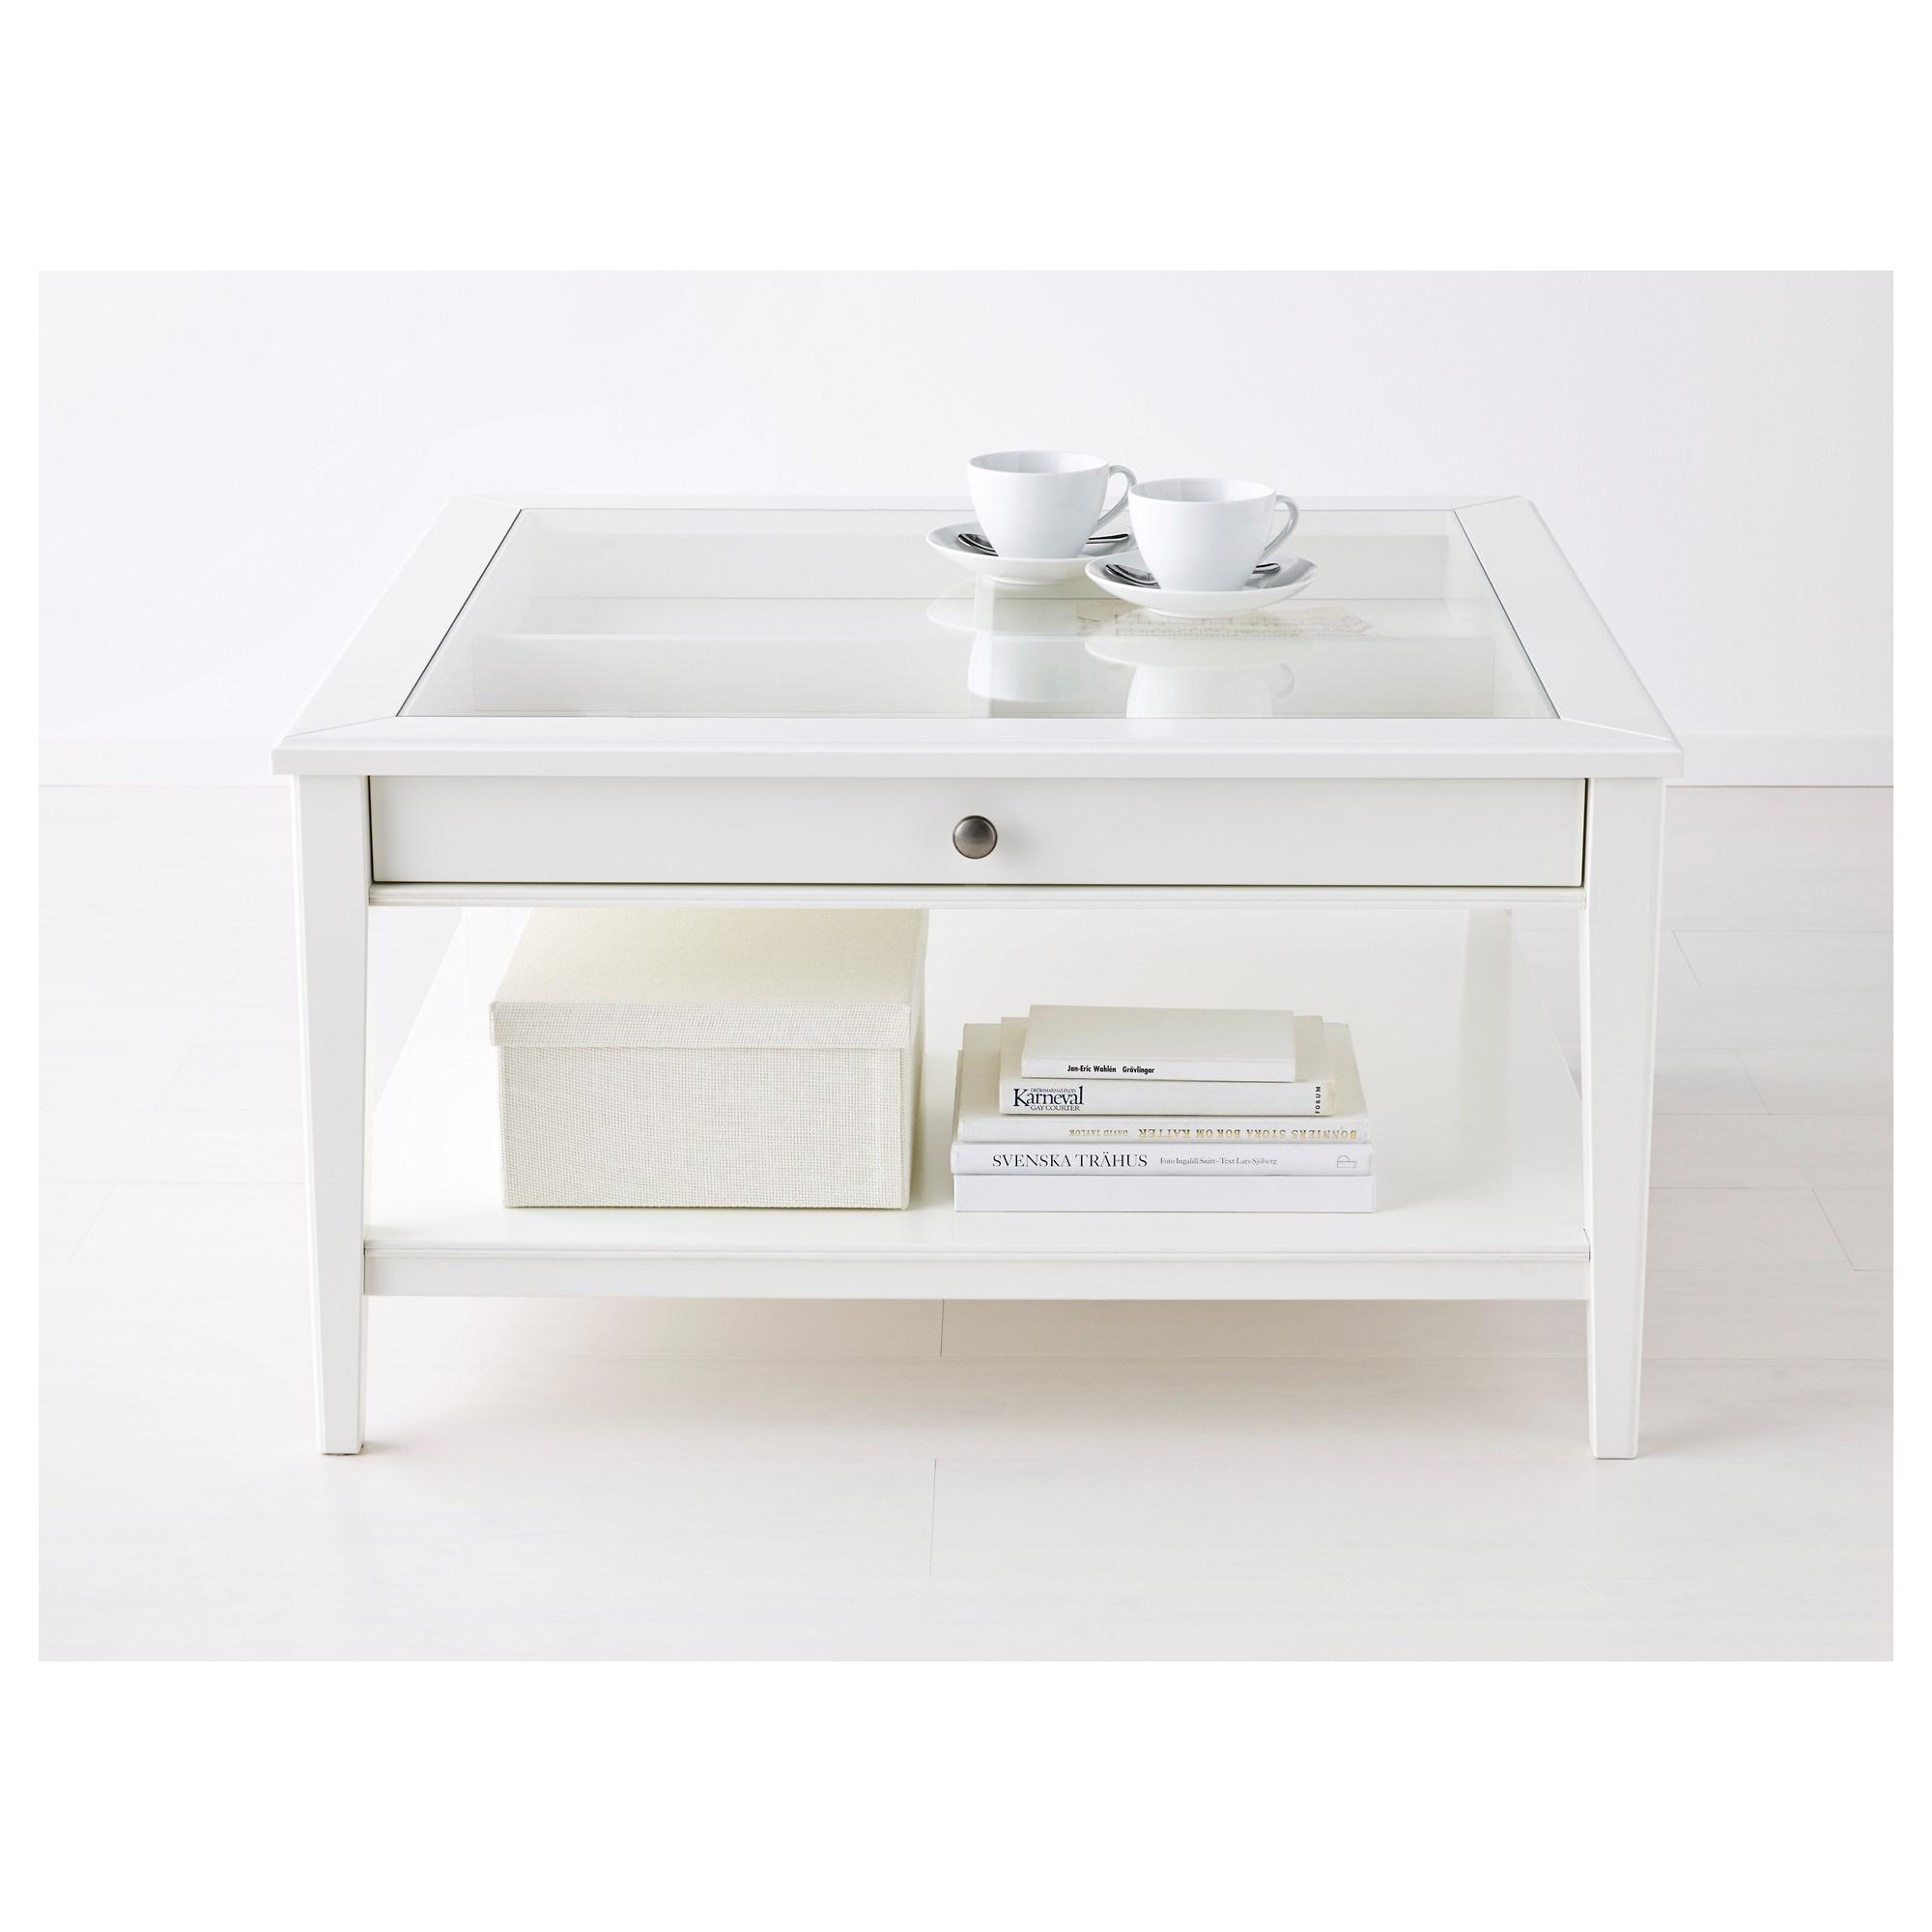 Liatorp Orta Sehpa Beyaz 93x93 Cm Ikea Oturma Odalari